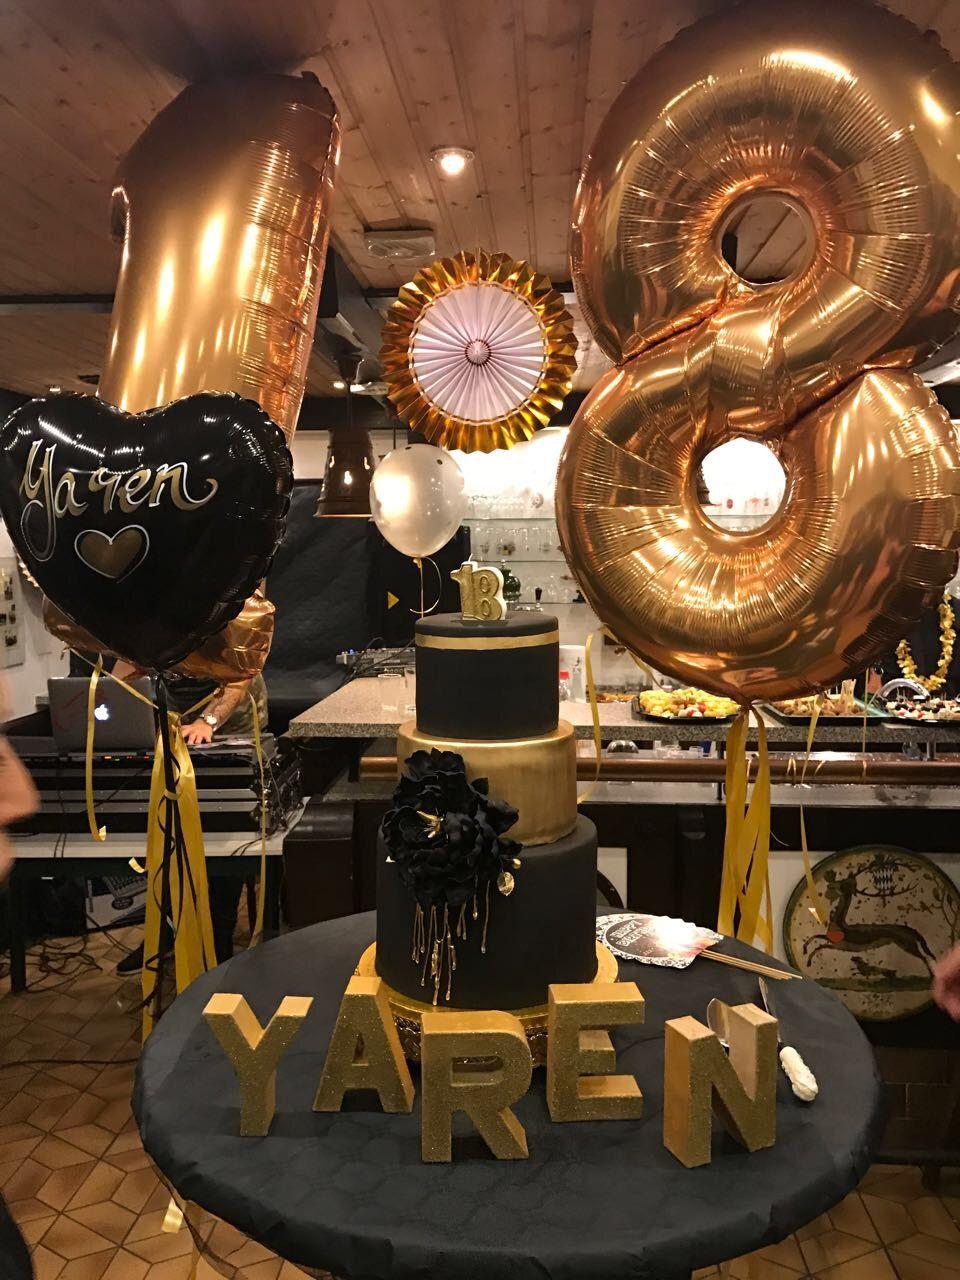 18 Birthday Girl Boy Black Gold Blackandgold Blackgold Love Passion Family Celebrate 18birthdaycake 18birthday Balloons Balloonart